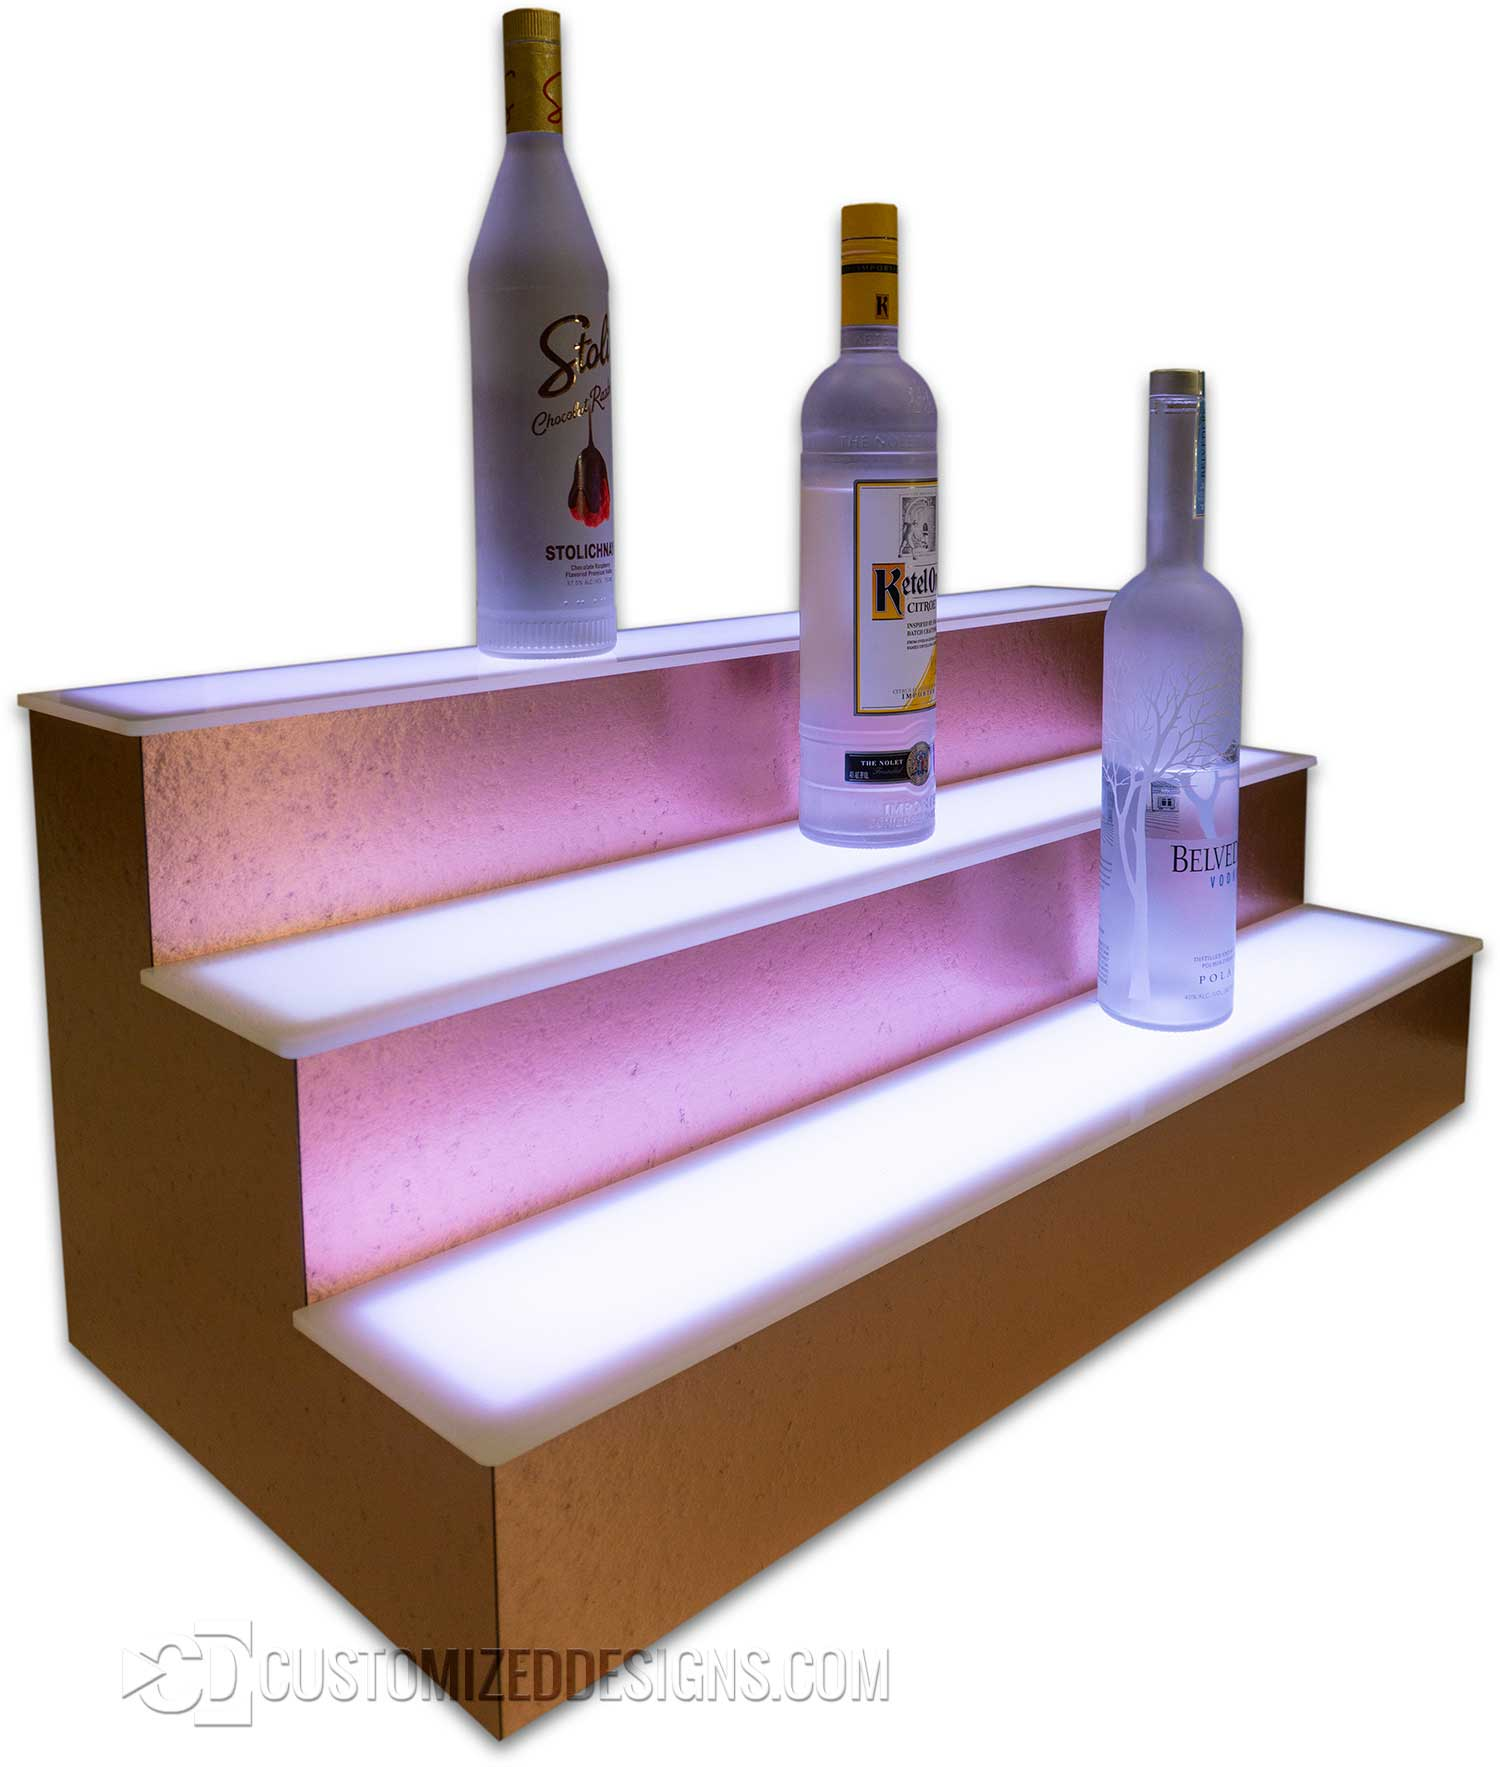 Moonscape Copper Display Shelves